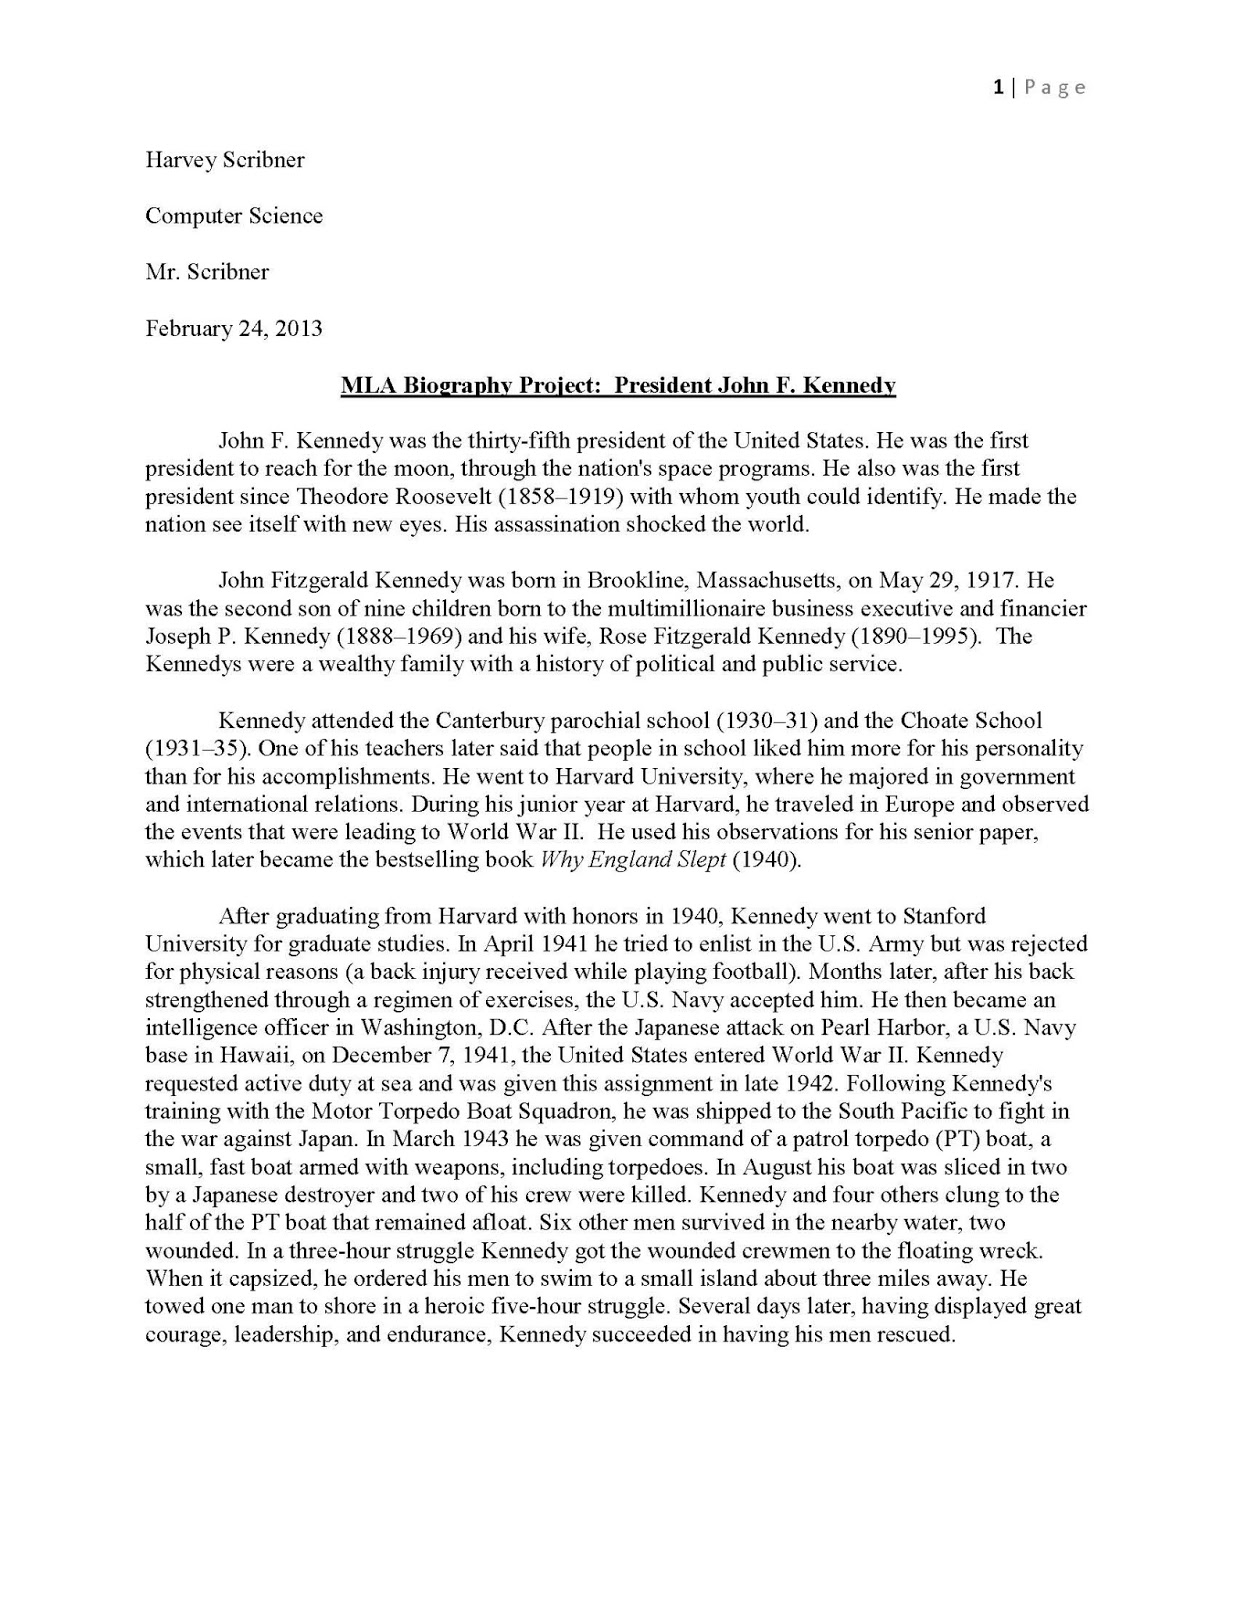 012 Jfkmlashortformbiographyreportexample Page 1 Essay Example Unique Autobiography Pdf Examples For College Full